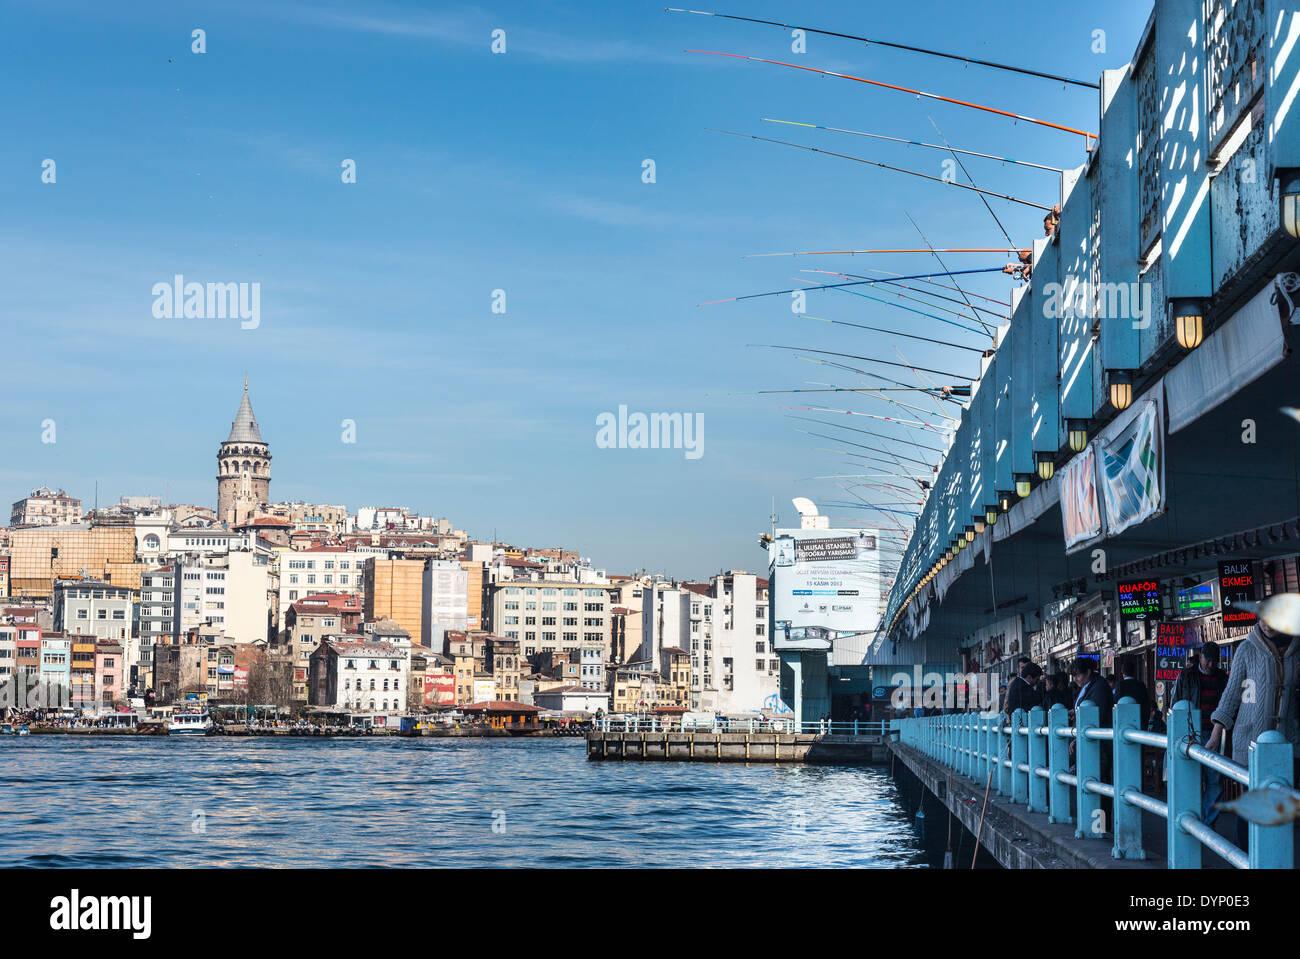 View from Eminonu across the Golden Horn and Galata bridge to Galata tower and Beyoglu, and Karakoy, Istanbul, Turkey. - Stock Image